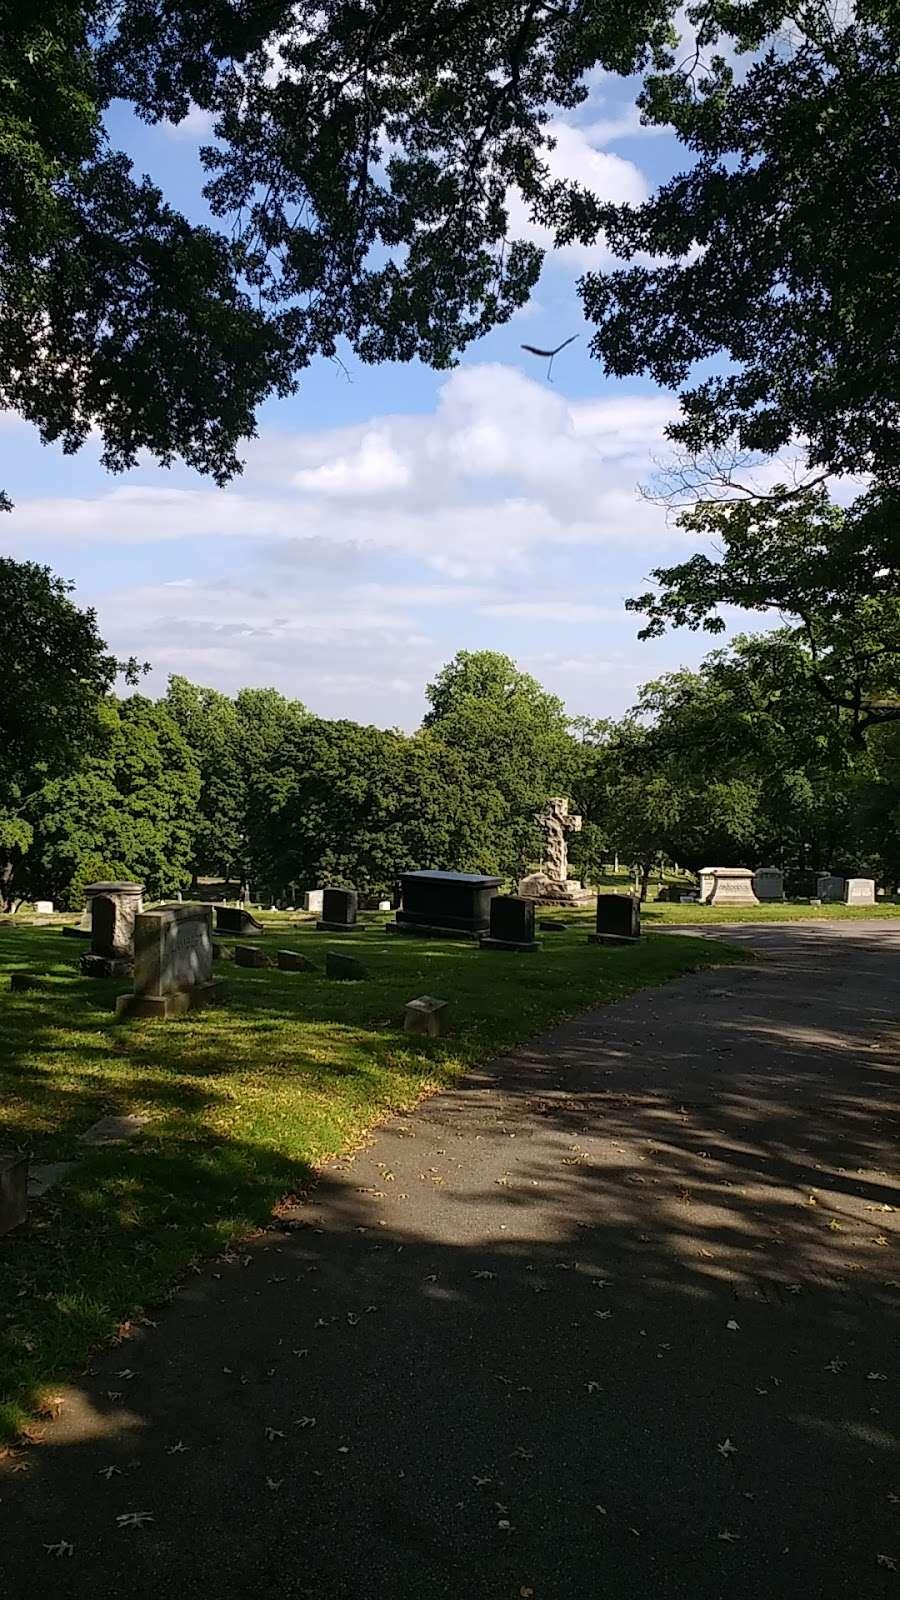 Cedar Lawn Cemetery - cemetery  | Photo 10 of 10 | Address: 200 McLean Blvd, Paterson, NJ 07504, USA | Phone: (973) 279-1161